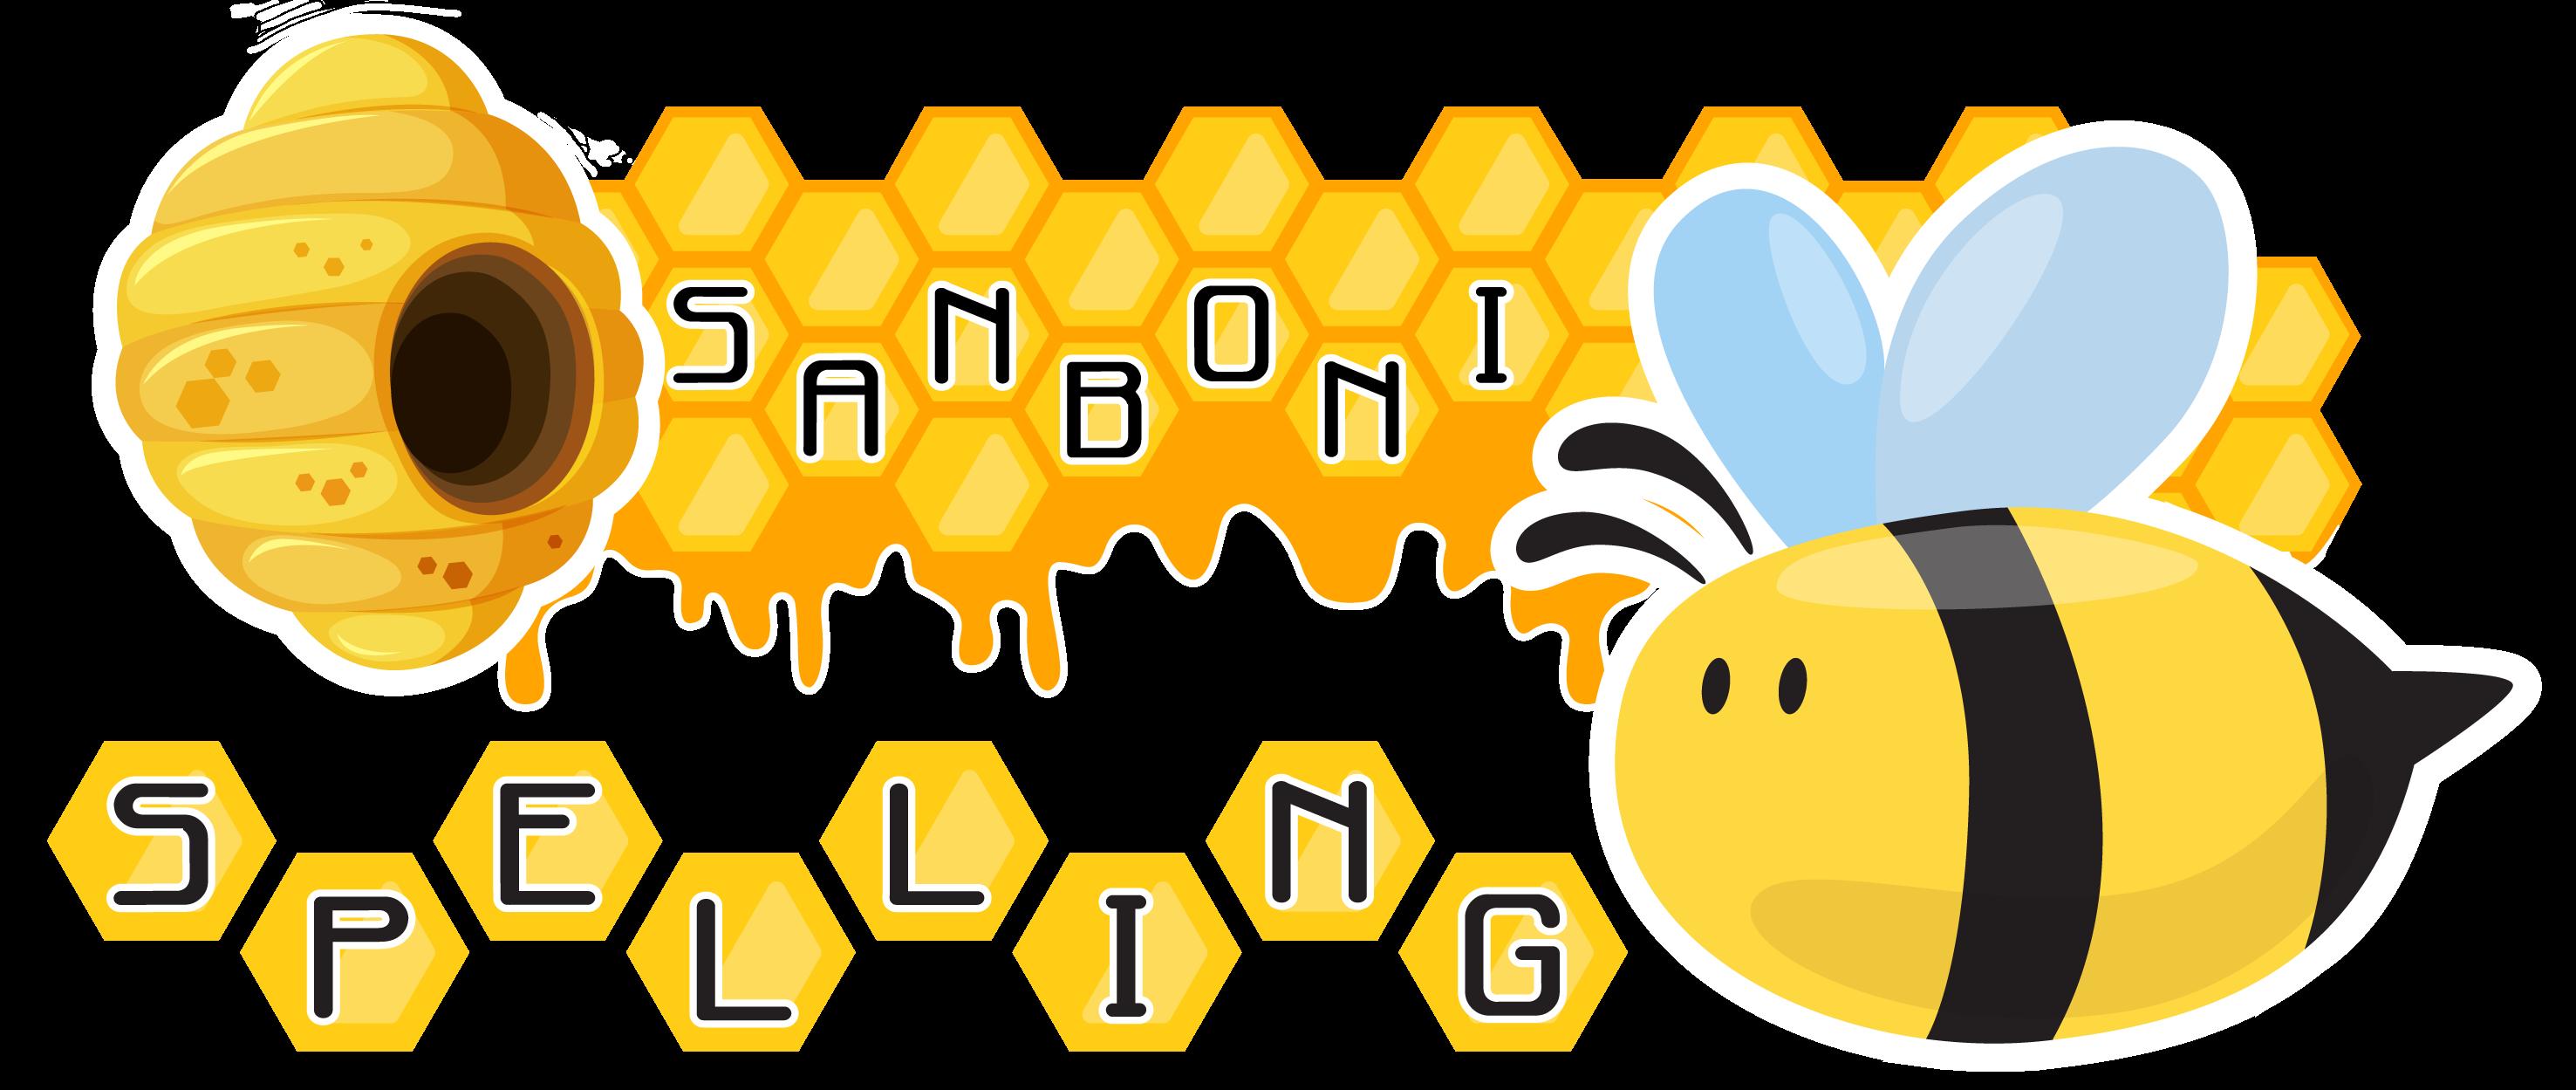 Sanboni_spelling_bee___1_